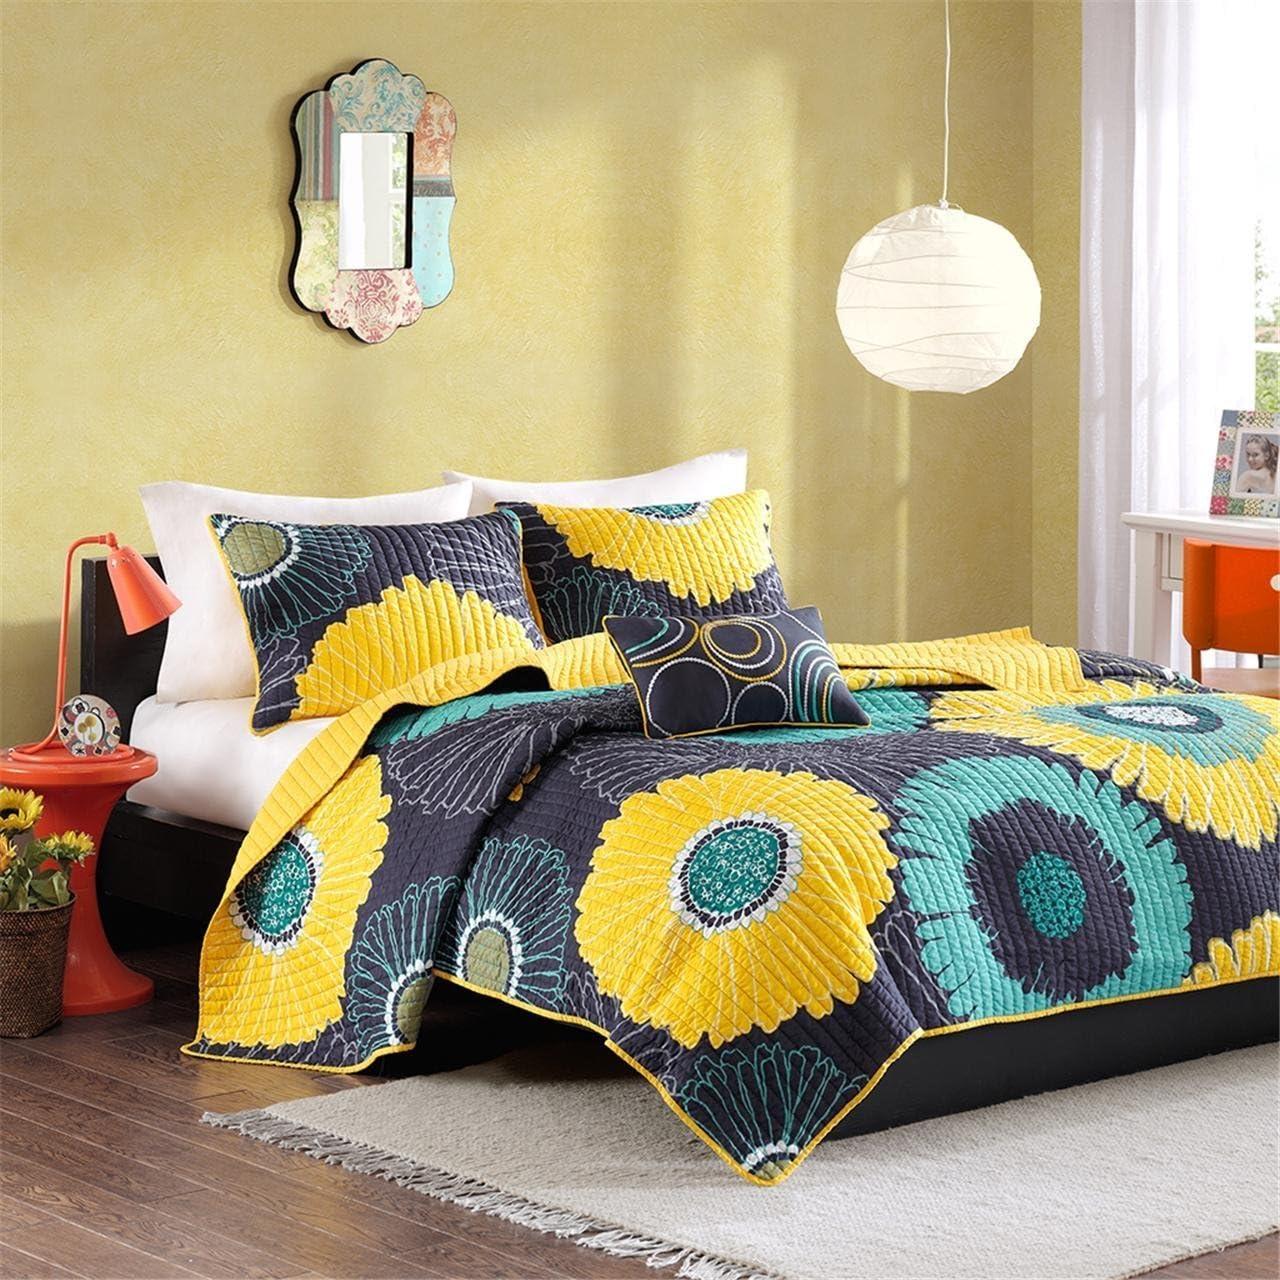 MI ZONE Cozy Quilt Set, Casual Modern Vibrant Color Design All Season Teen Bedding, Coverlet Bedspread, Decorative Pillow, Girls Bedroom Décor, Full/Queen, Yellow